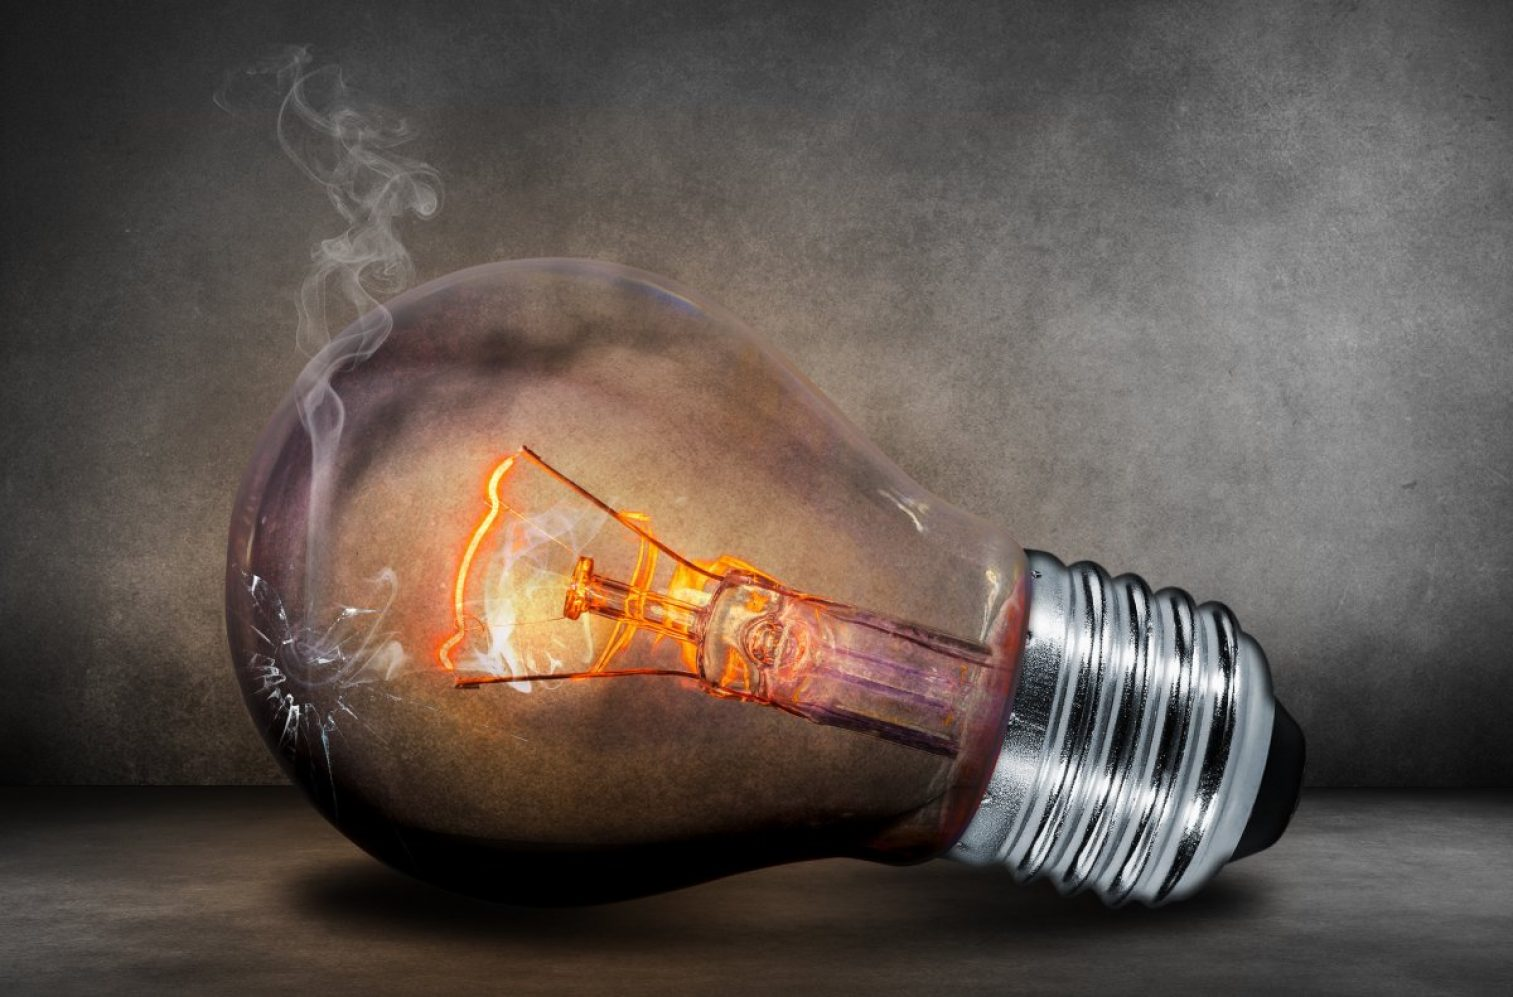 light bulb, incandescent, smoke